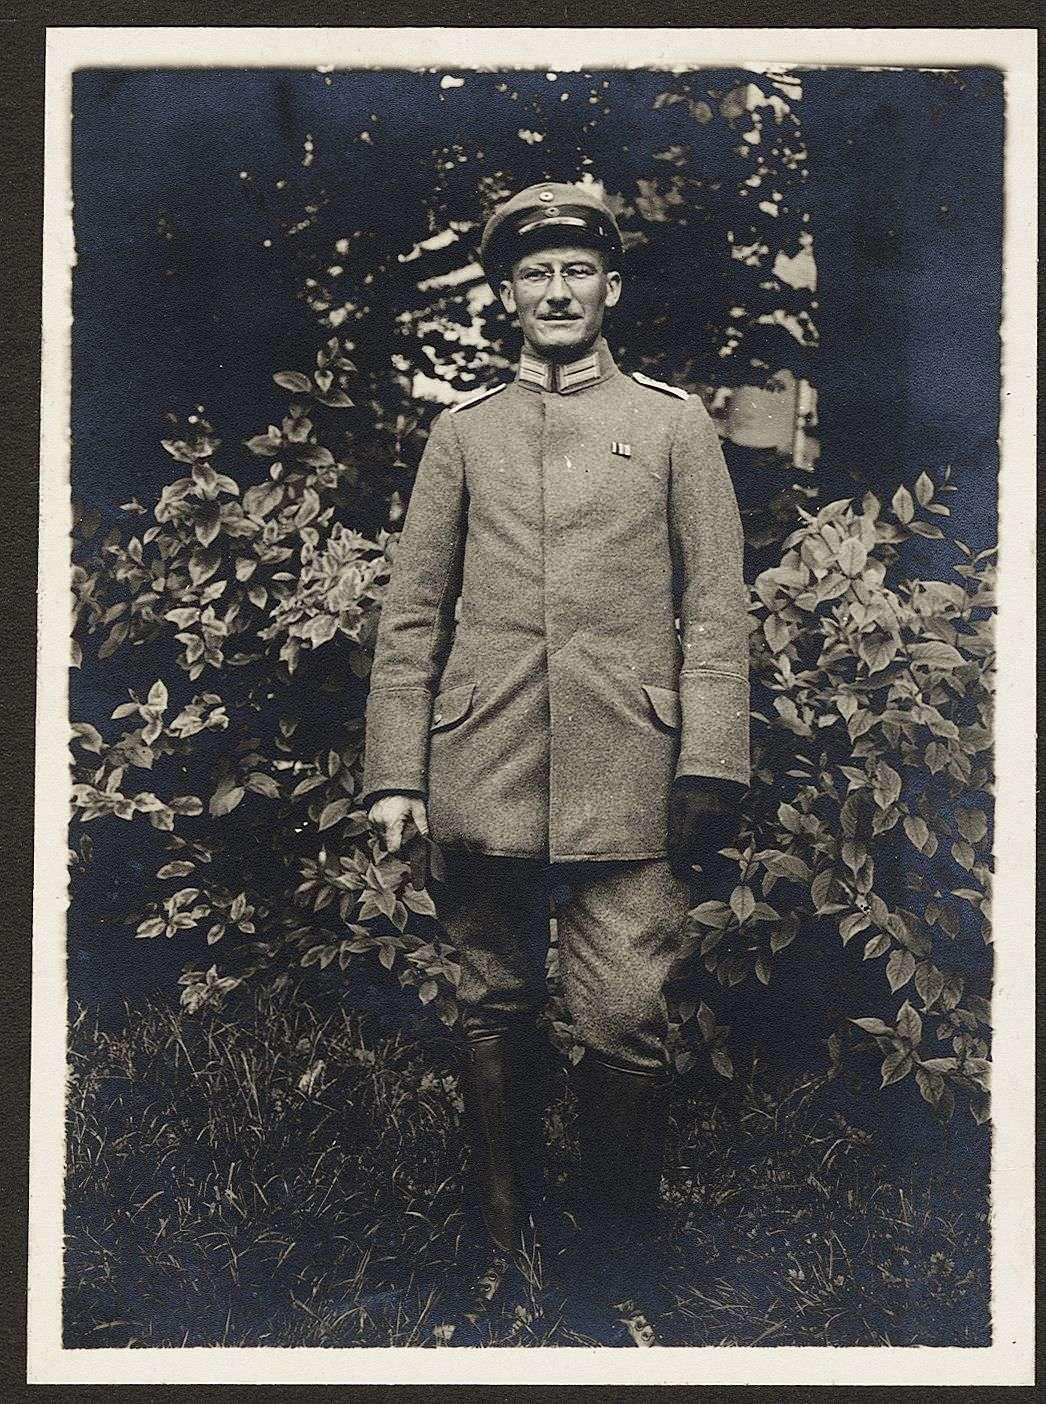 Erbe, Wilhelm, Bild 1